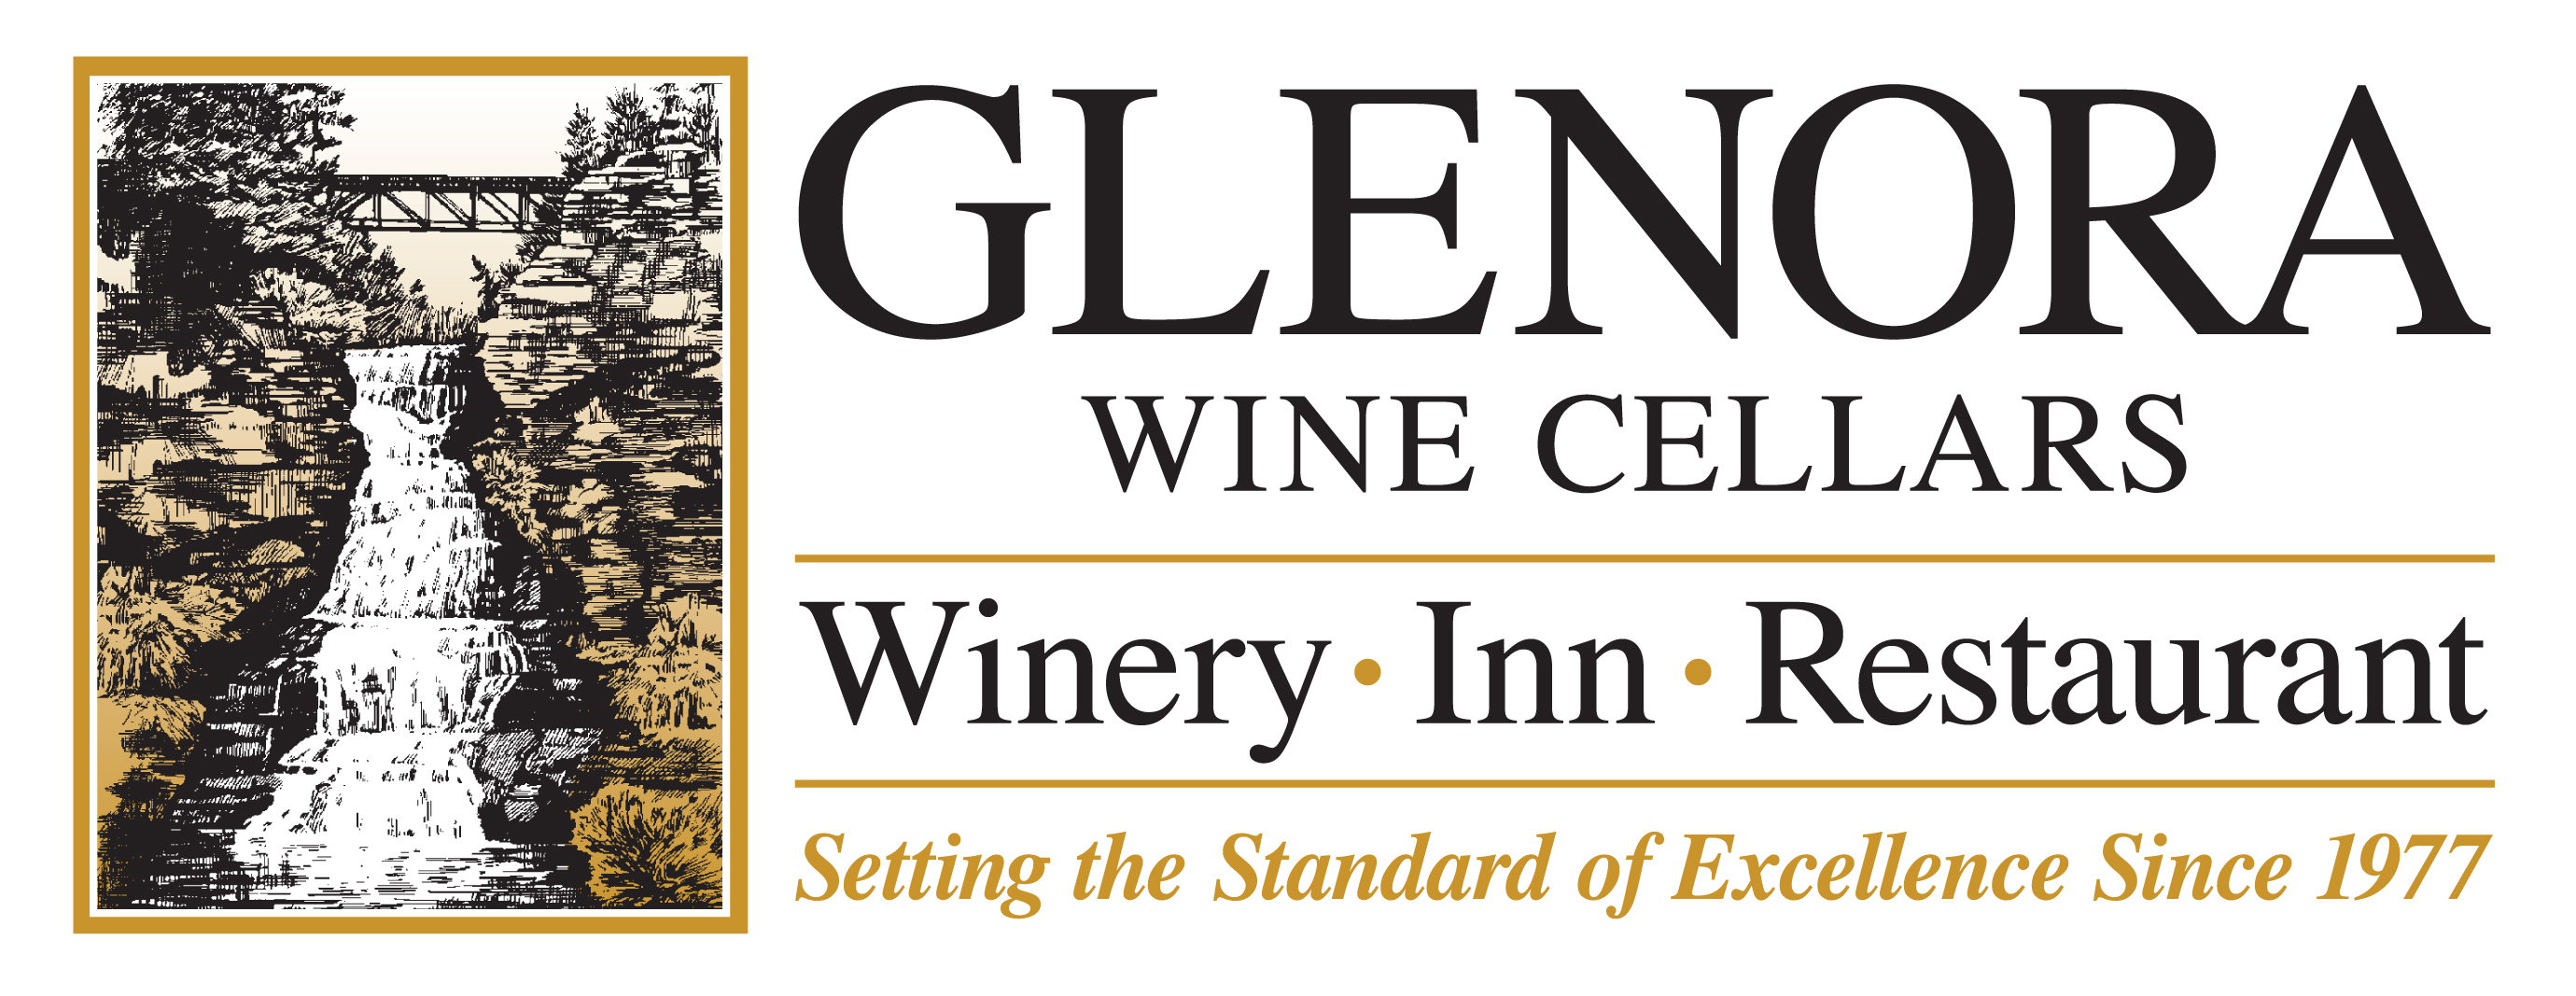 Seneca Lake Winery Tours - Wine Tasting - Glenora Wine Cellars